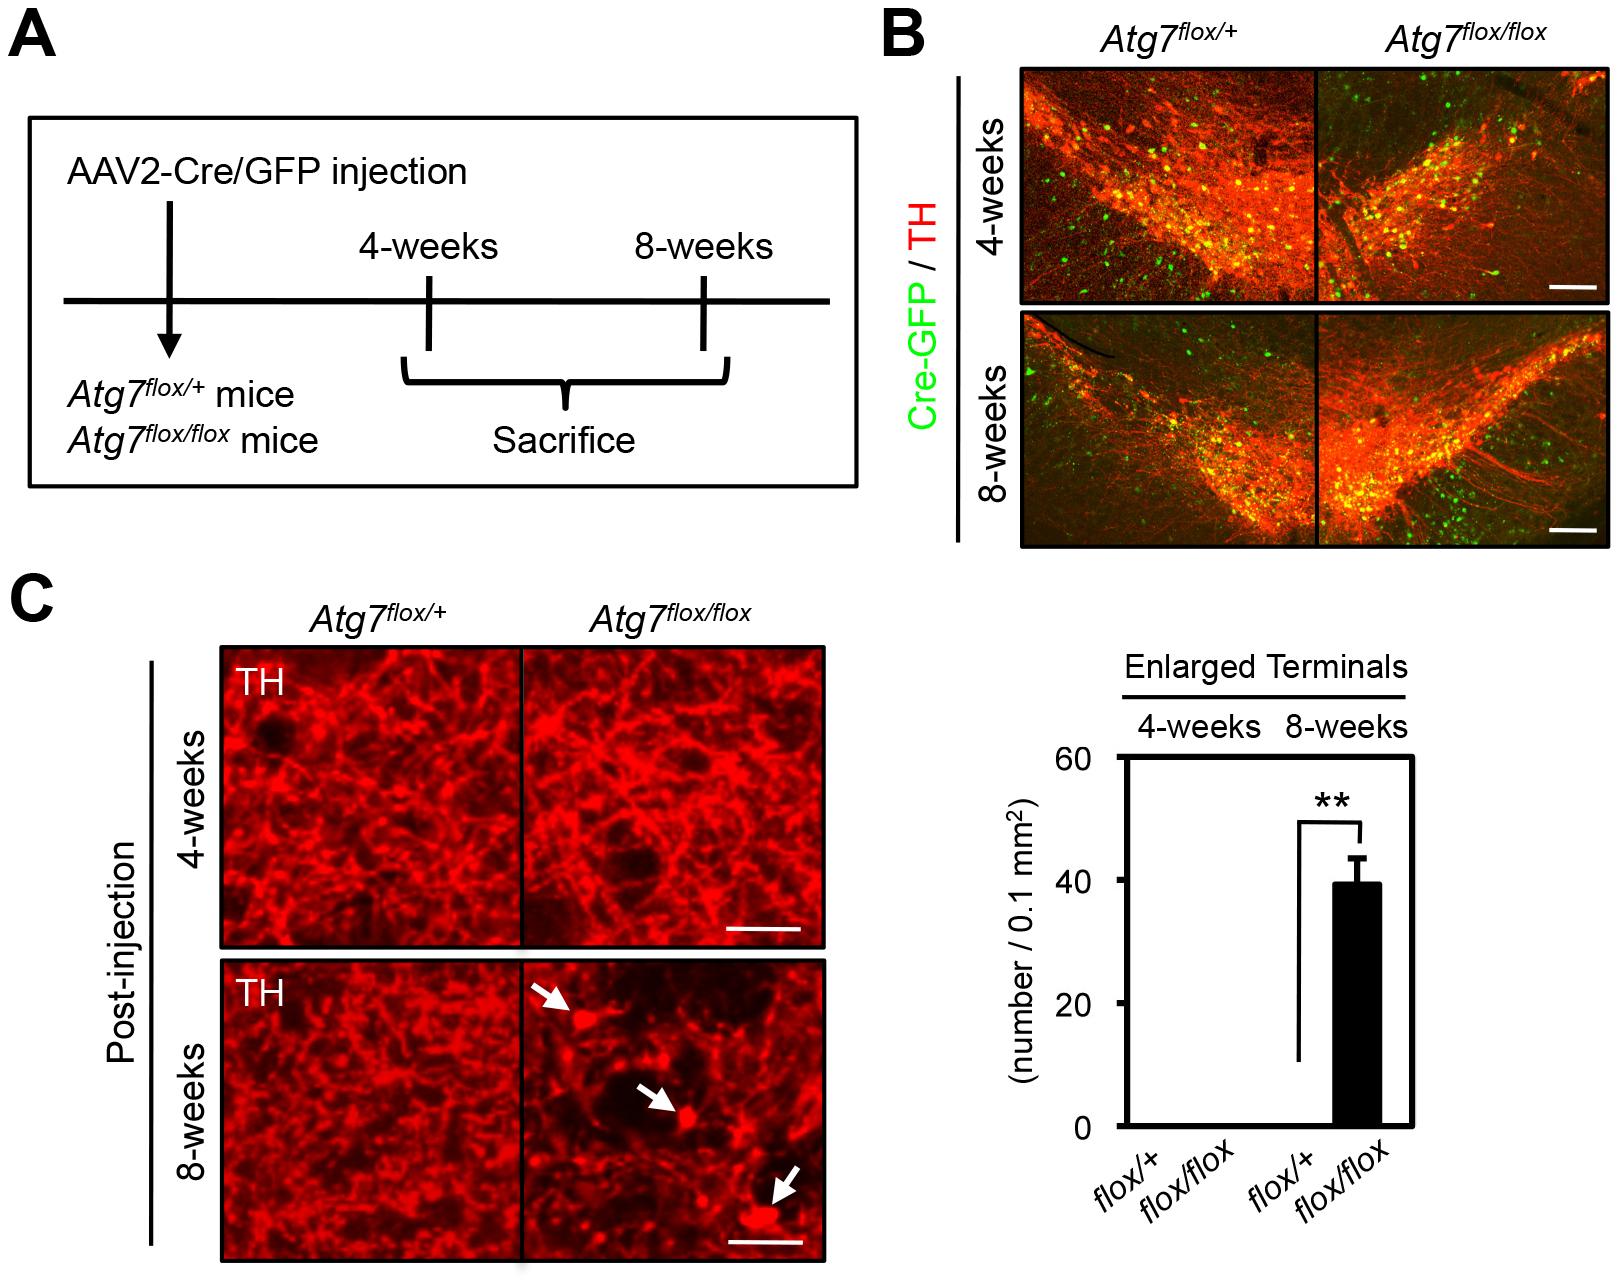 Atg7 regulates morphological plasticity of mature dopaminergic axon terminals.